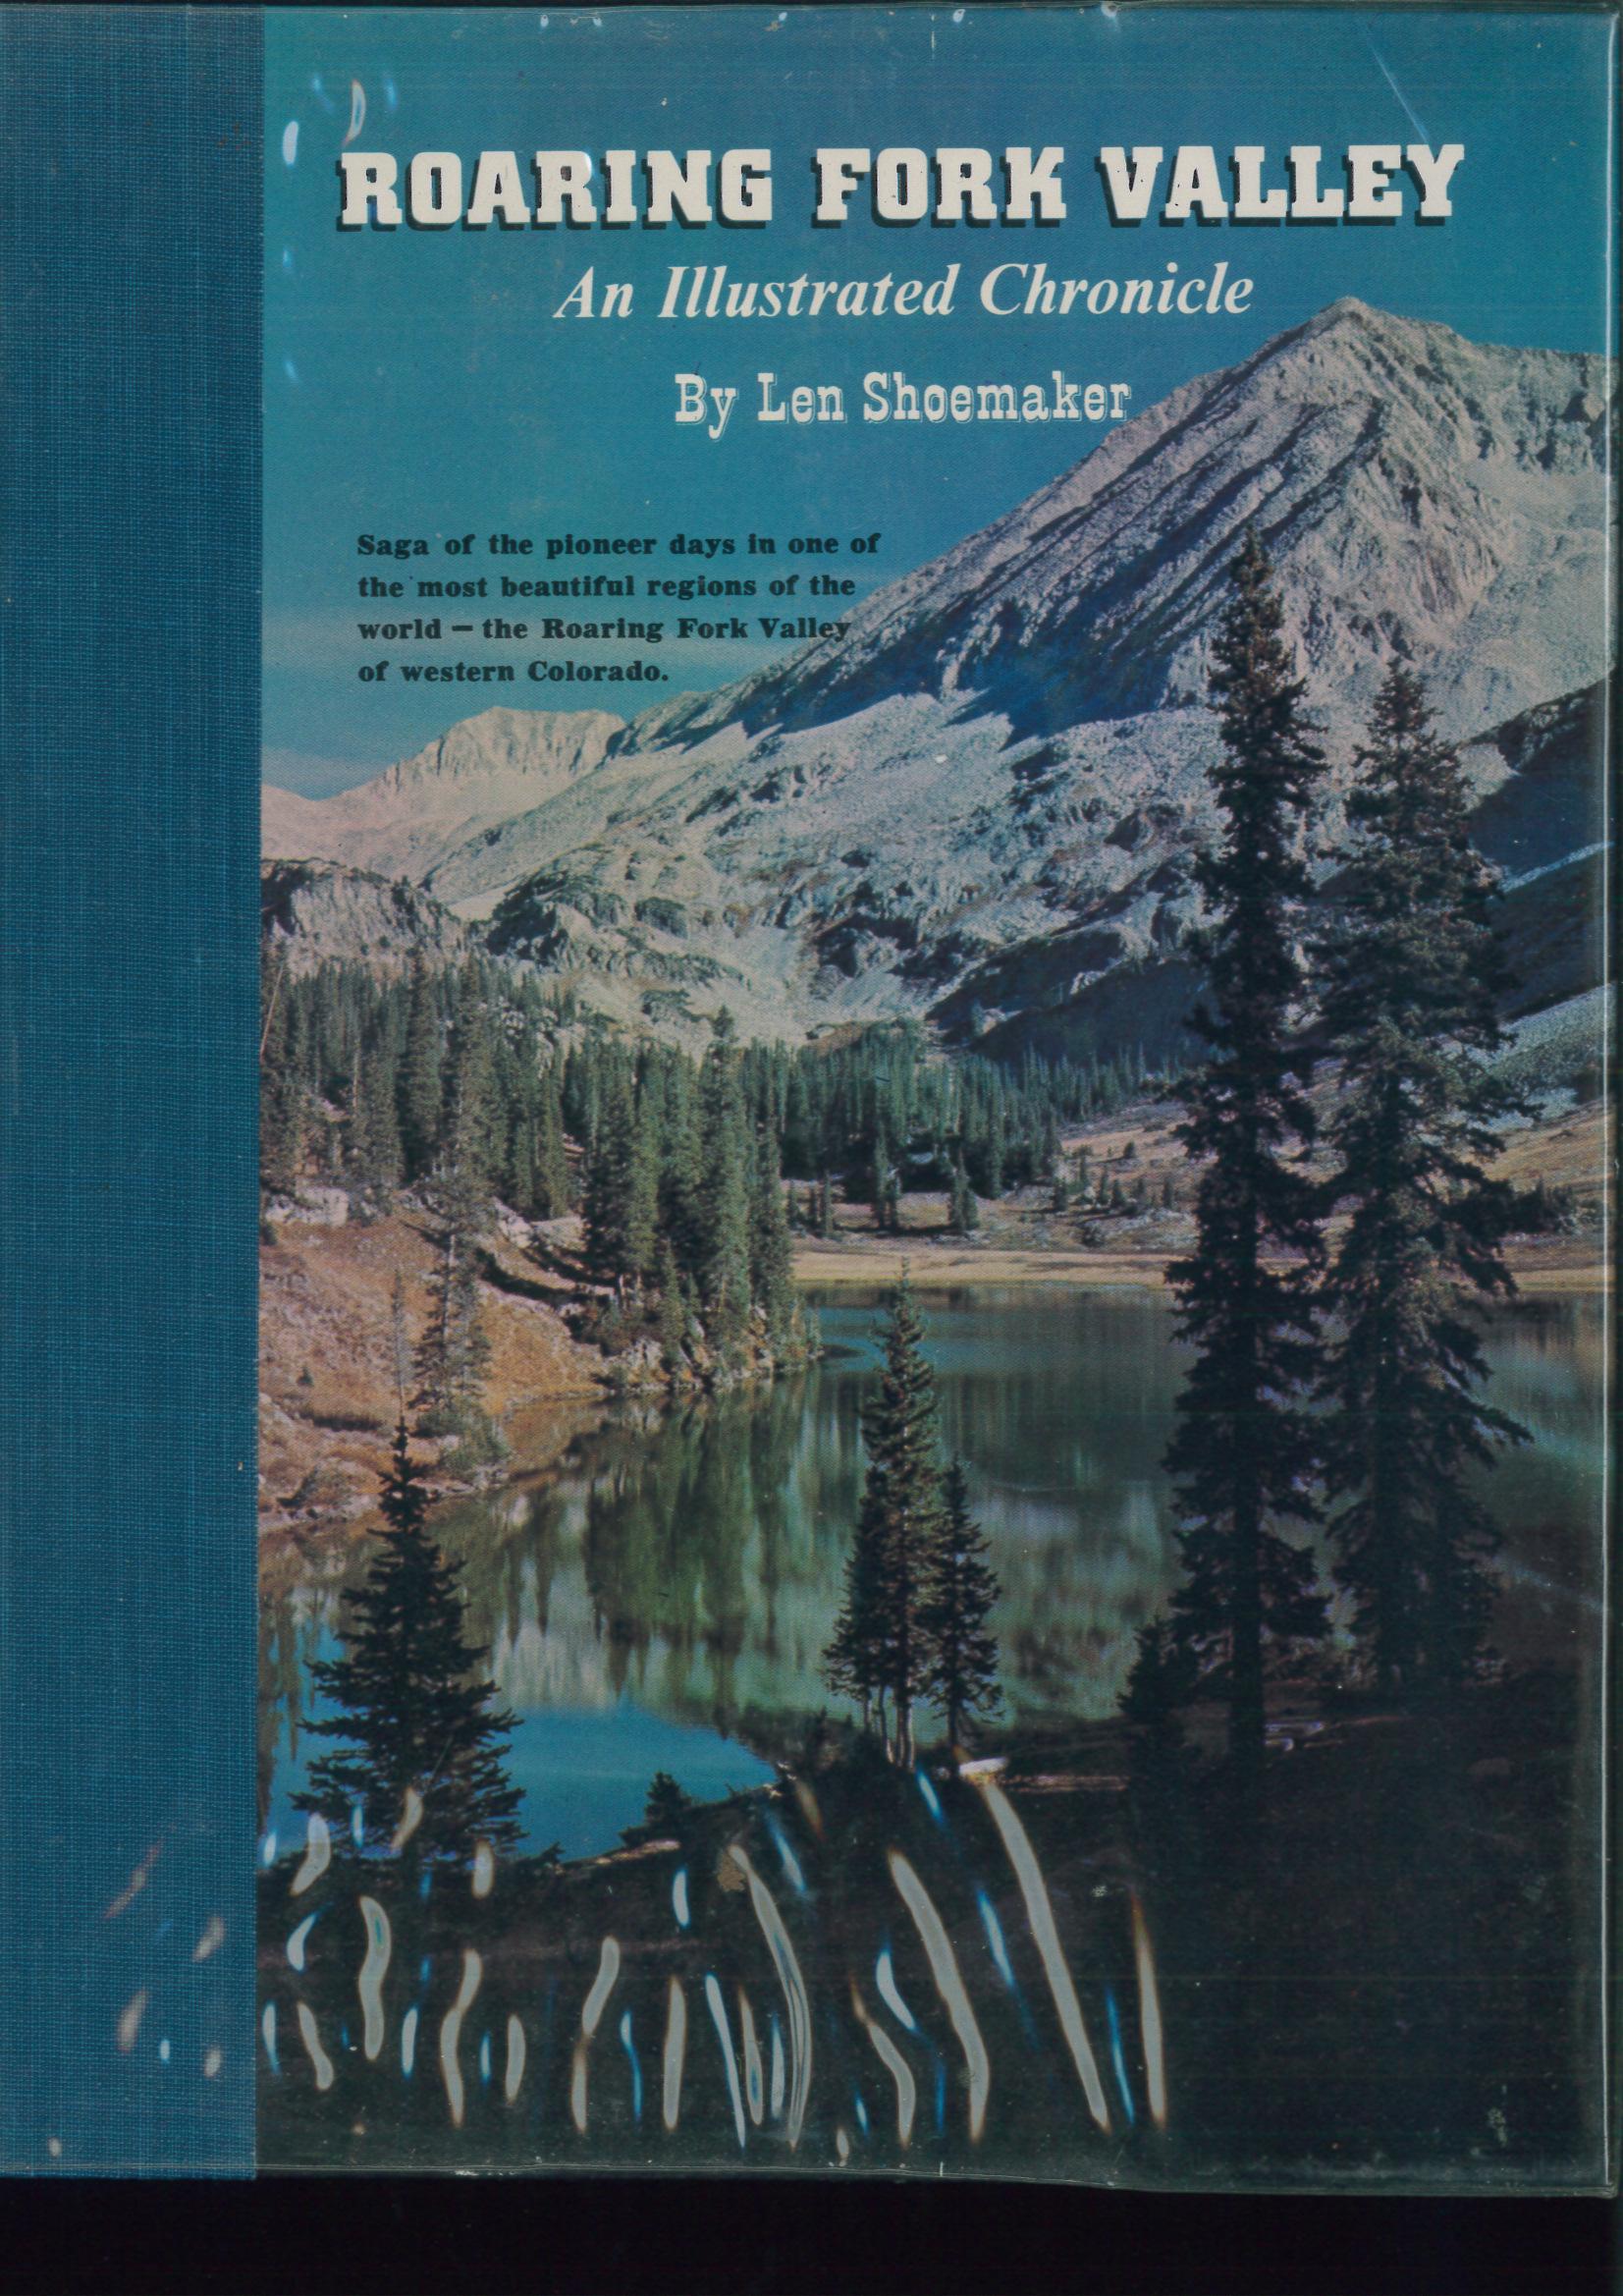 Roaring Fork Valley of Western Colorado  - Len Shoemaker | günstig bestellen bei Modelleisenbahn Center  MCS Vertriebs GmbH